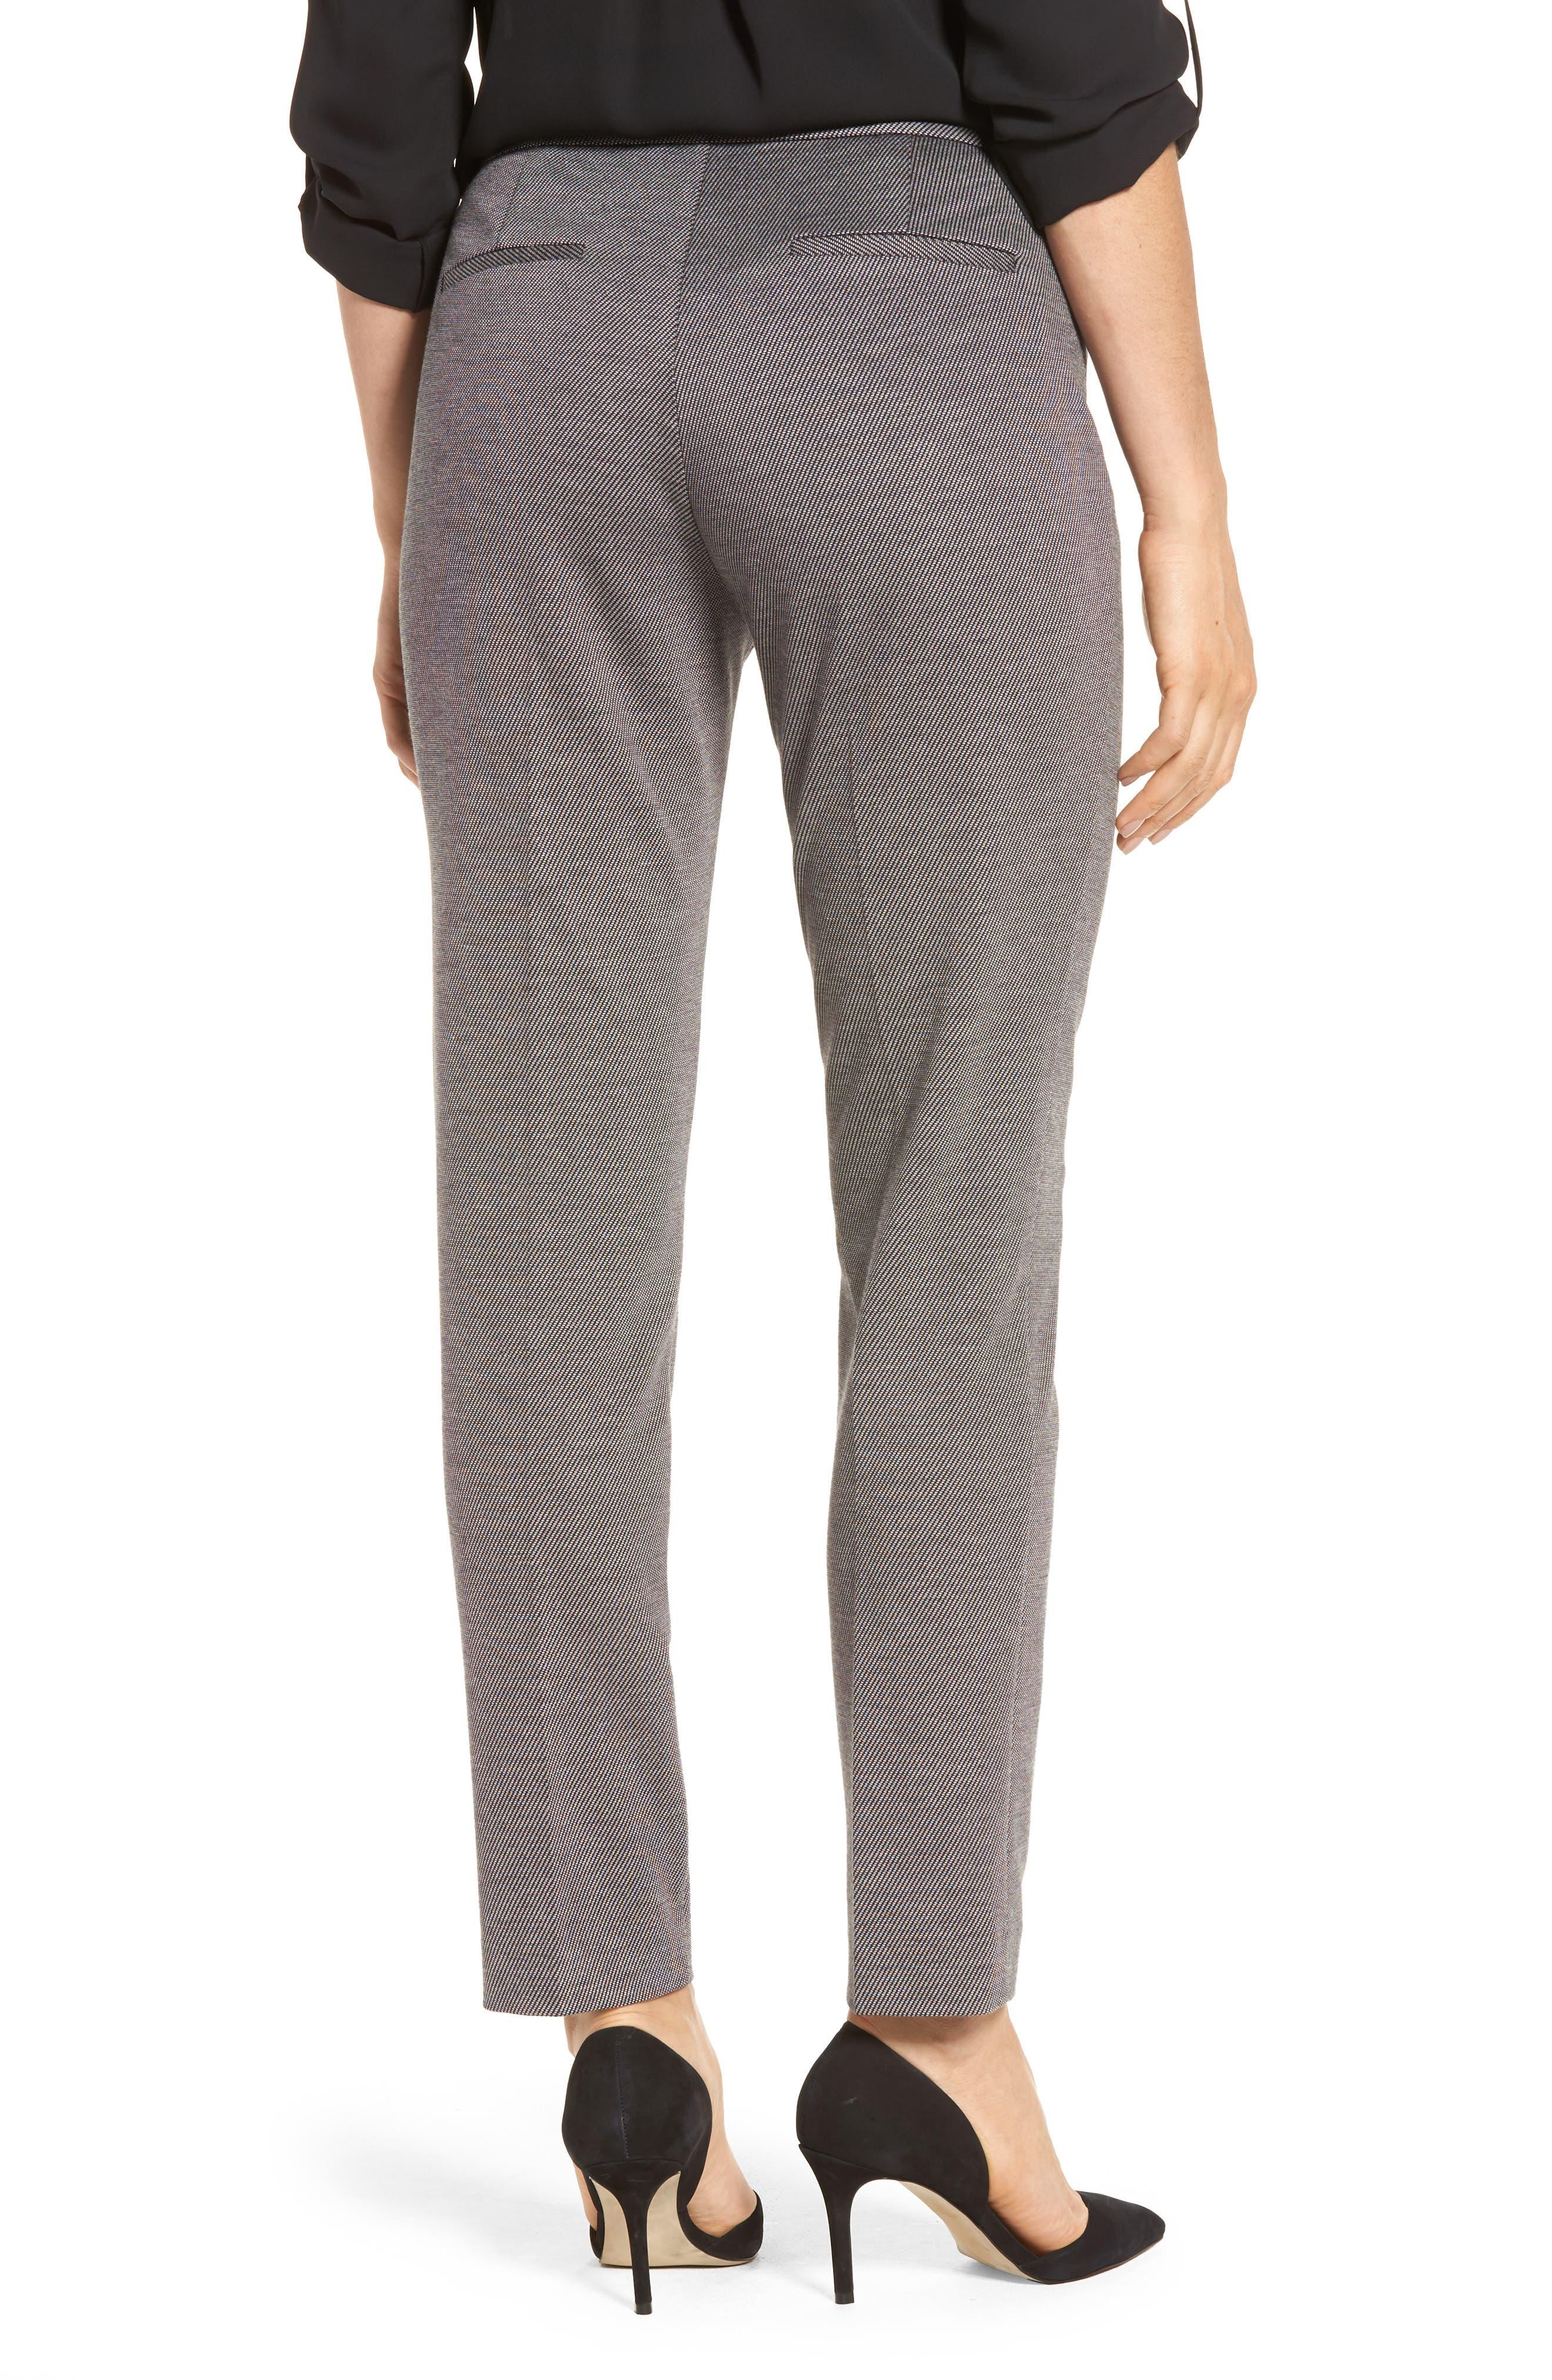 Alternate Image 2  - Chaus Slim Twill Ponte Knit Pants